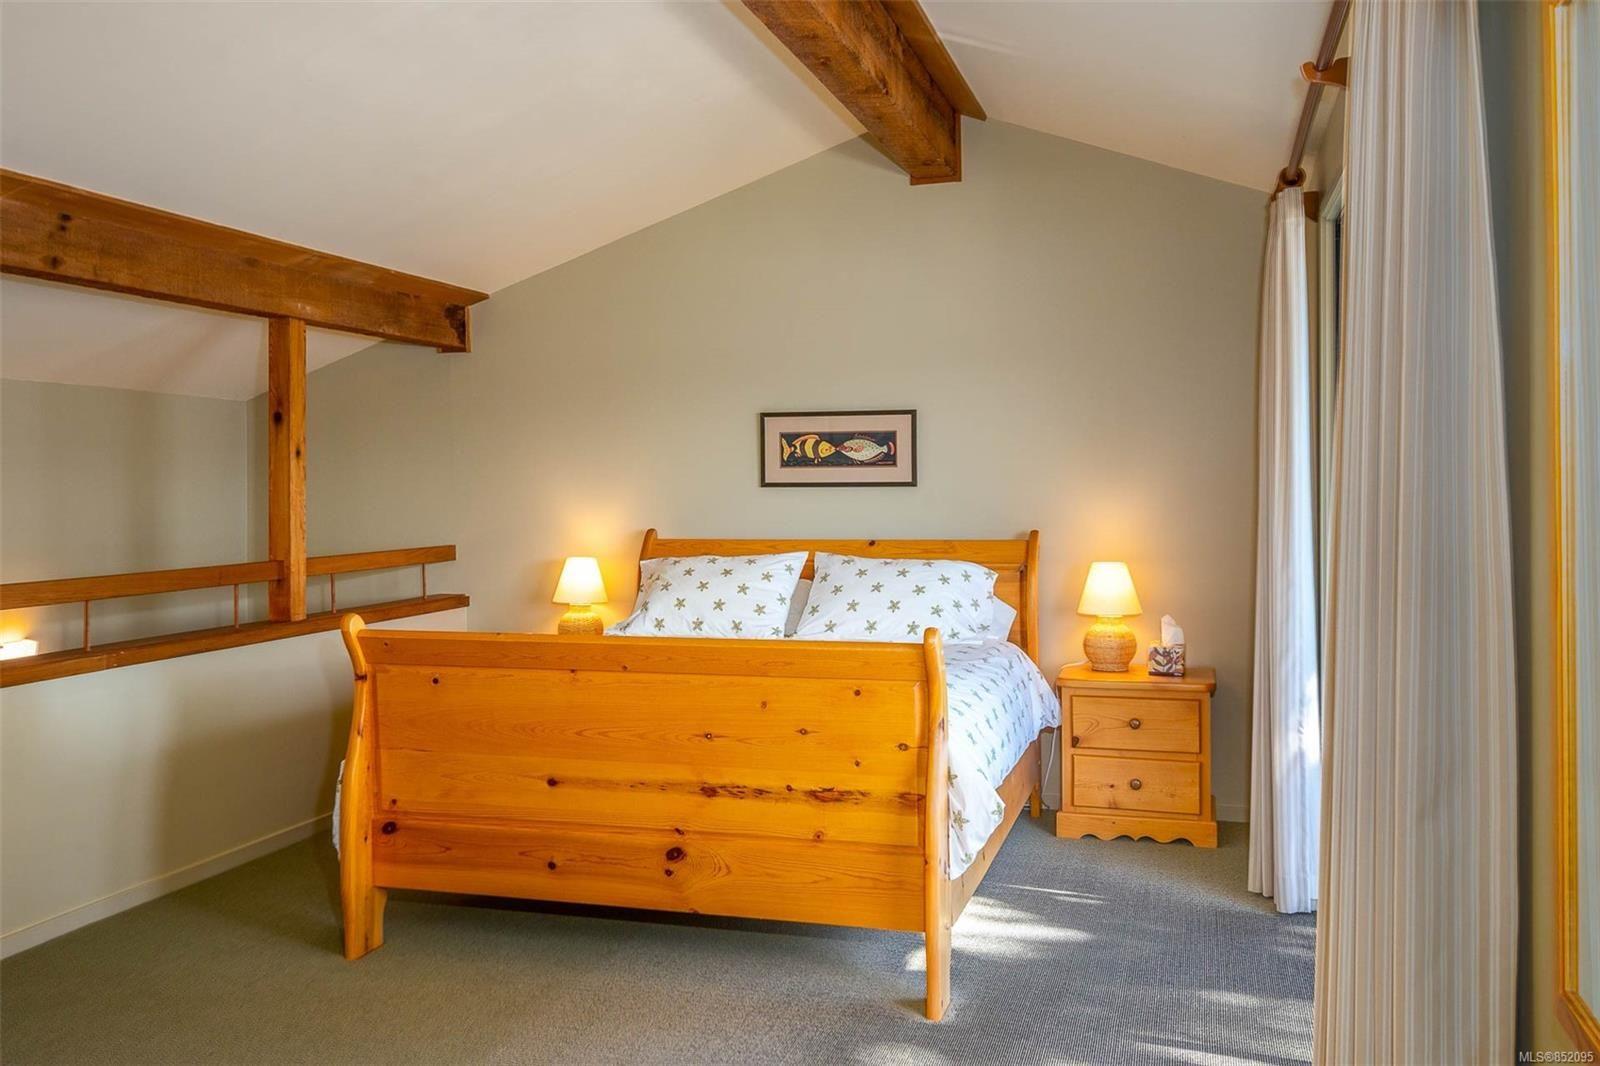 Photo 14: Photos: 236 McGill Rd in : GI Salt Spring House for sale (Gulf Islands)  : MLS®# 852095